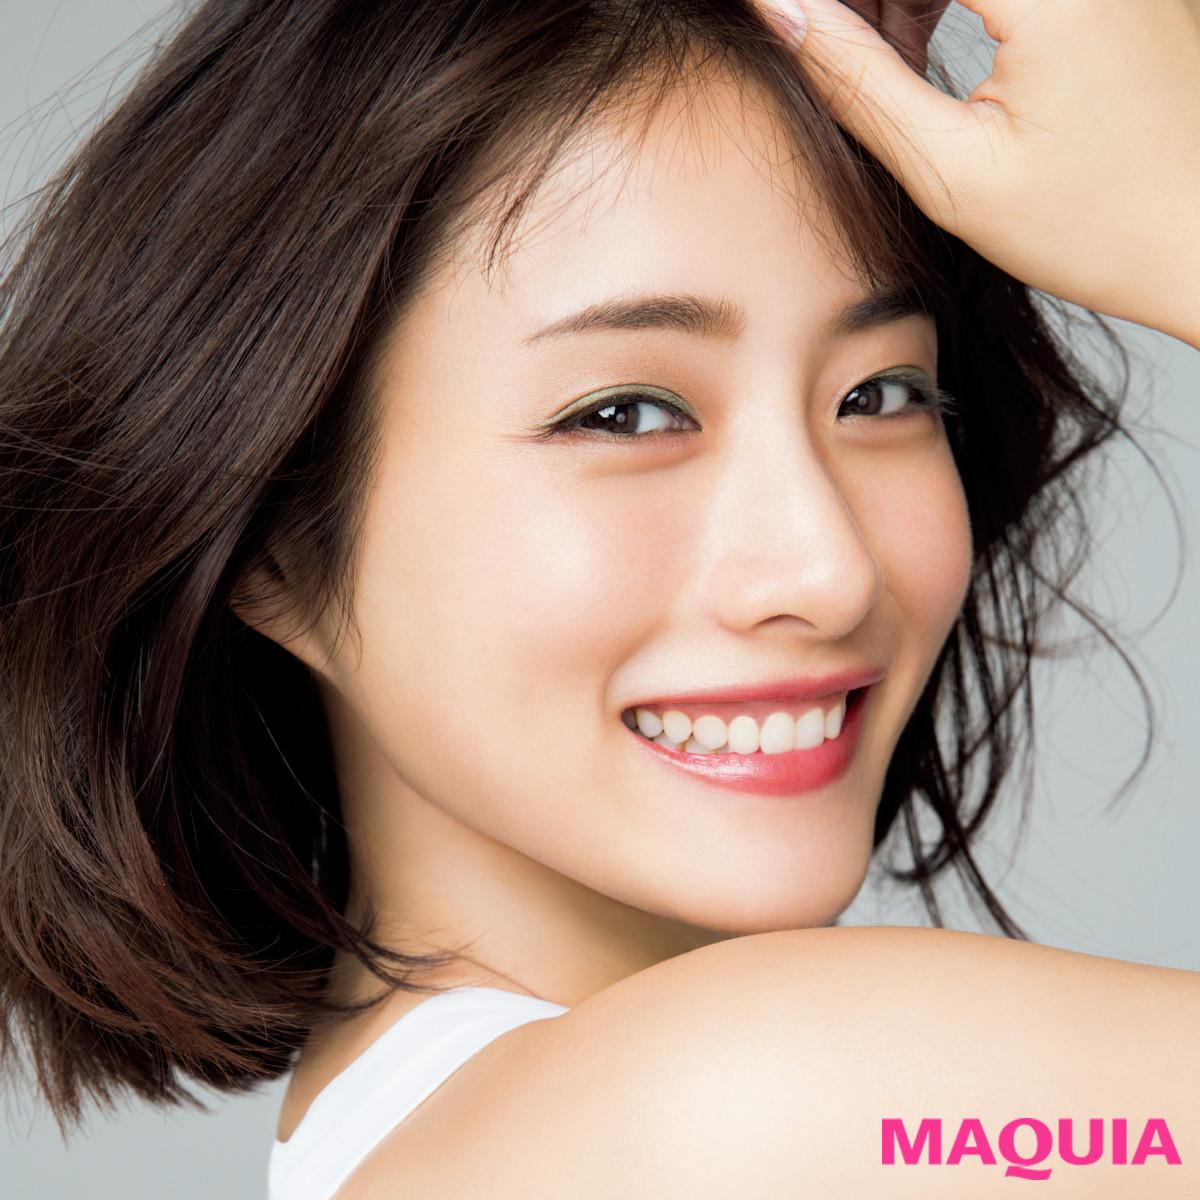 http://static-maquia.hpplus.jp/upload/image/manager/25/EGIXA1Q-1200.jpg